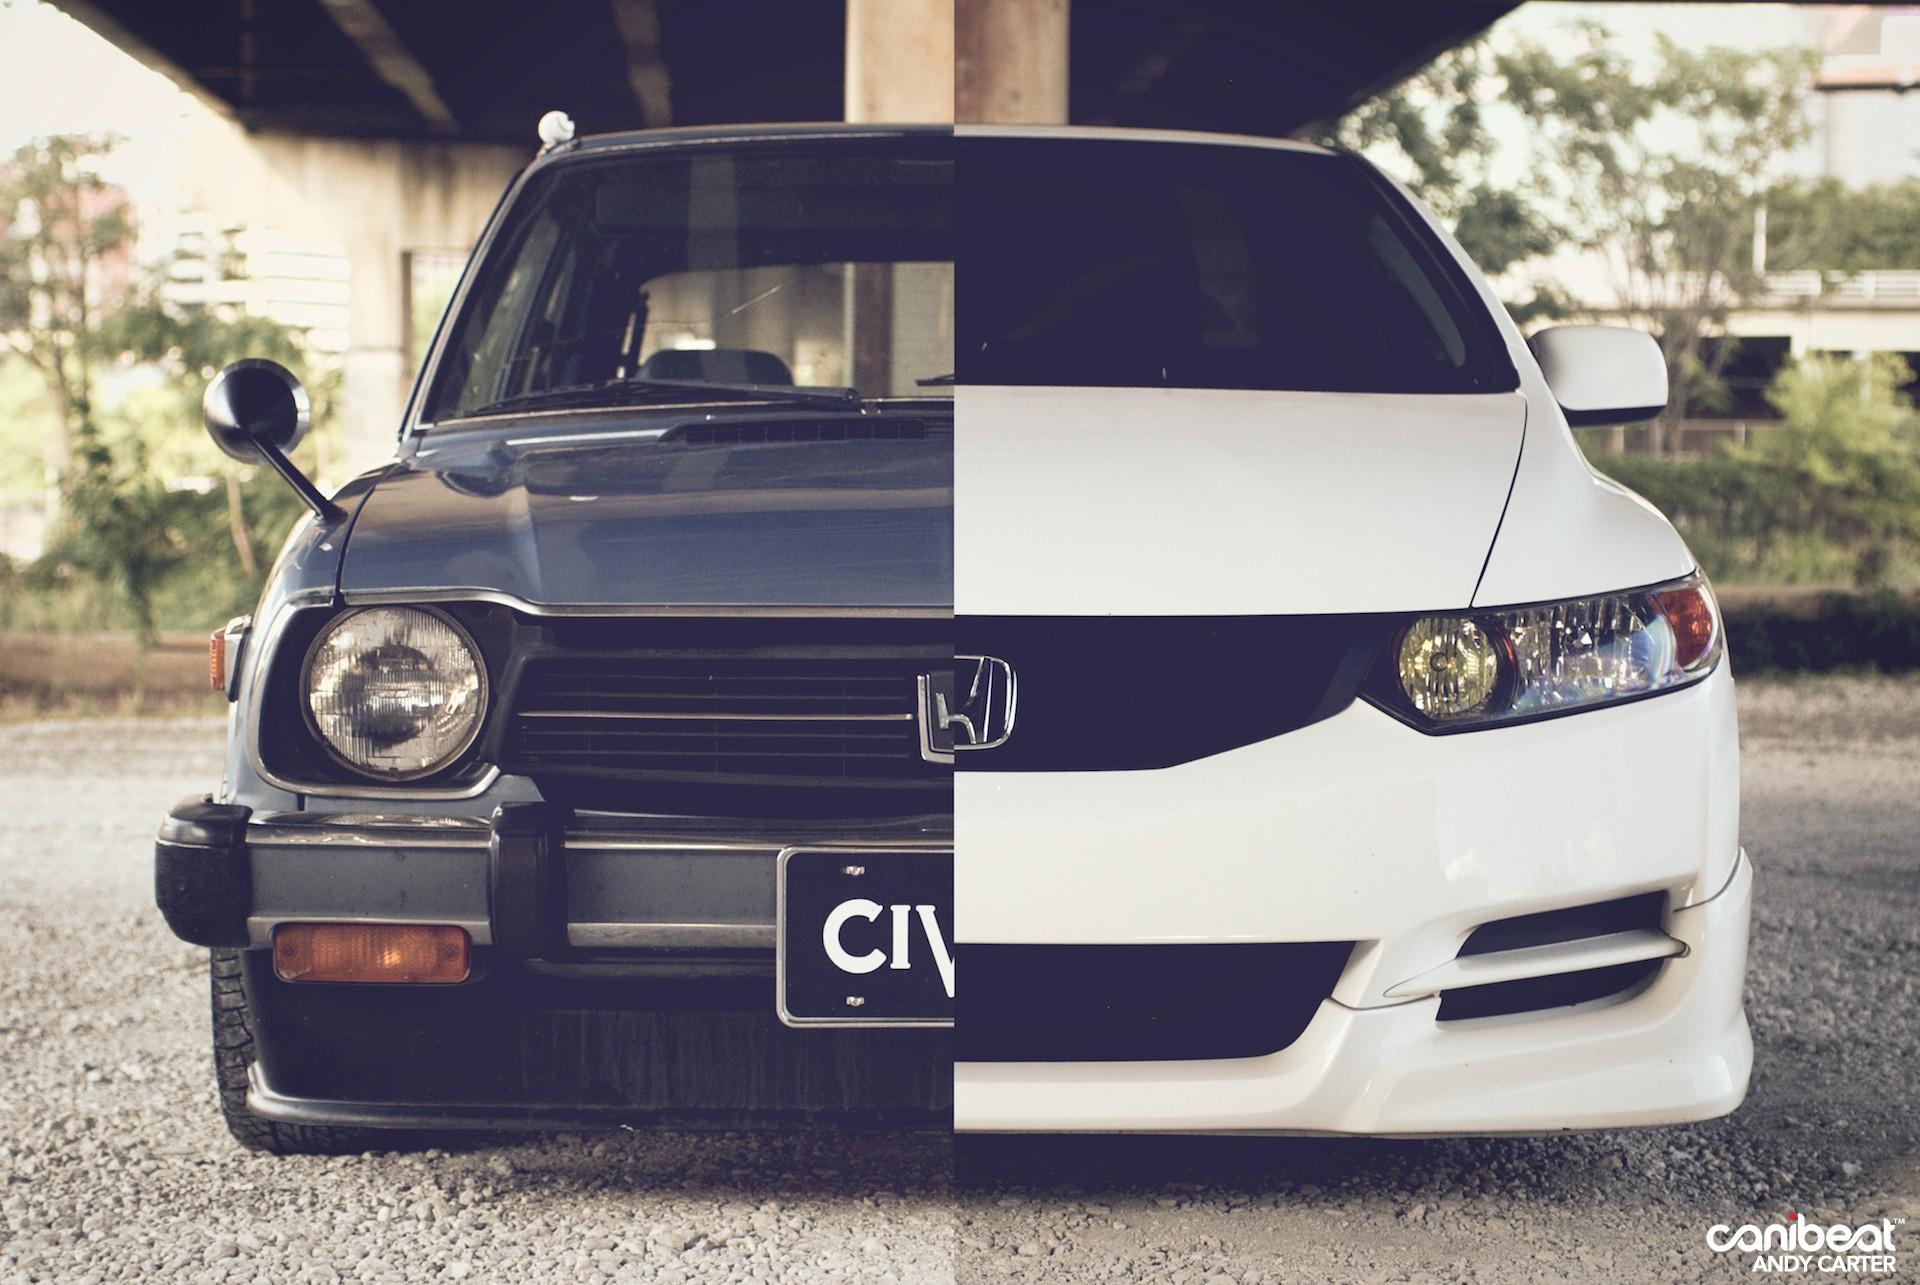 Honda Civic Full HD Wallpaper And Background Image